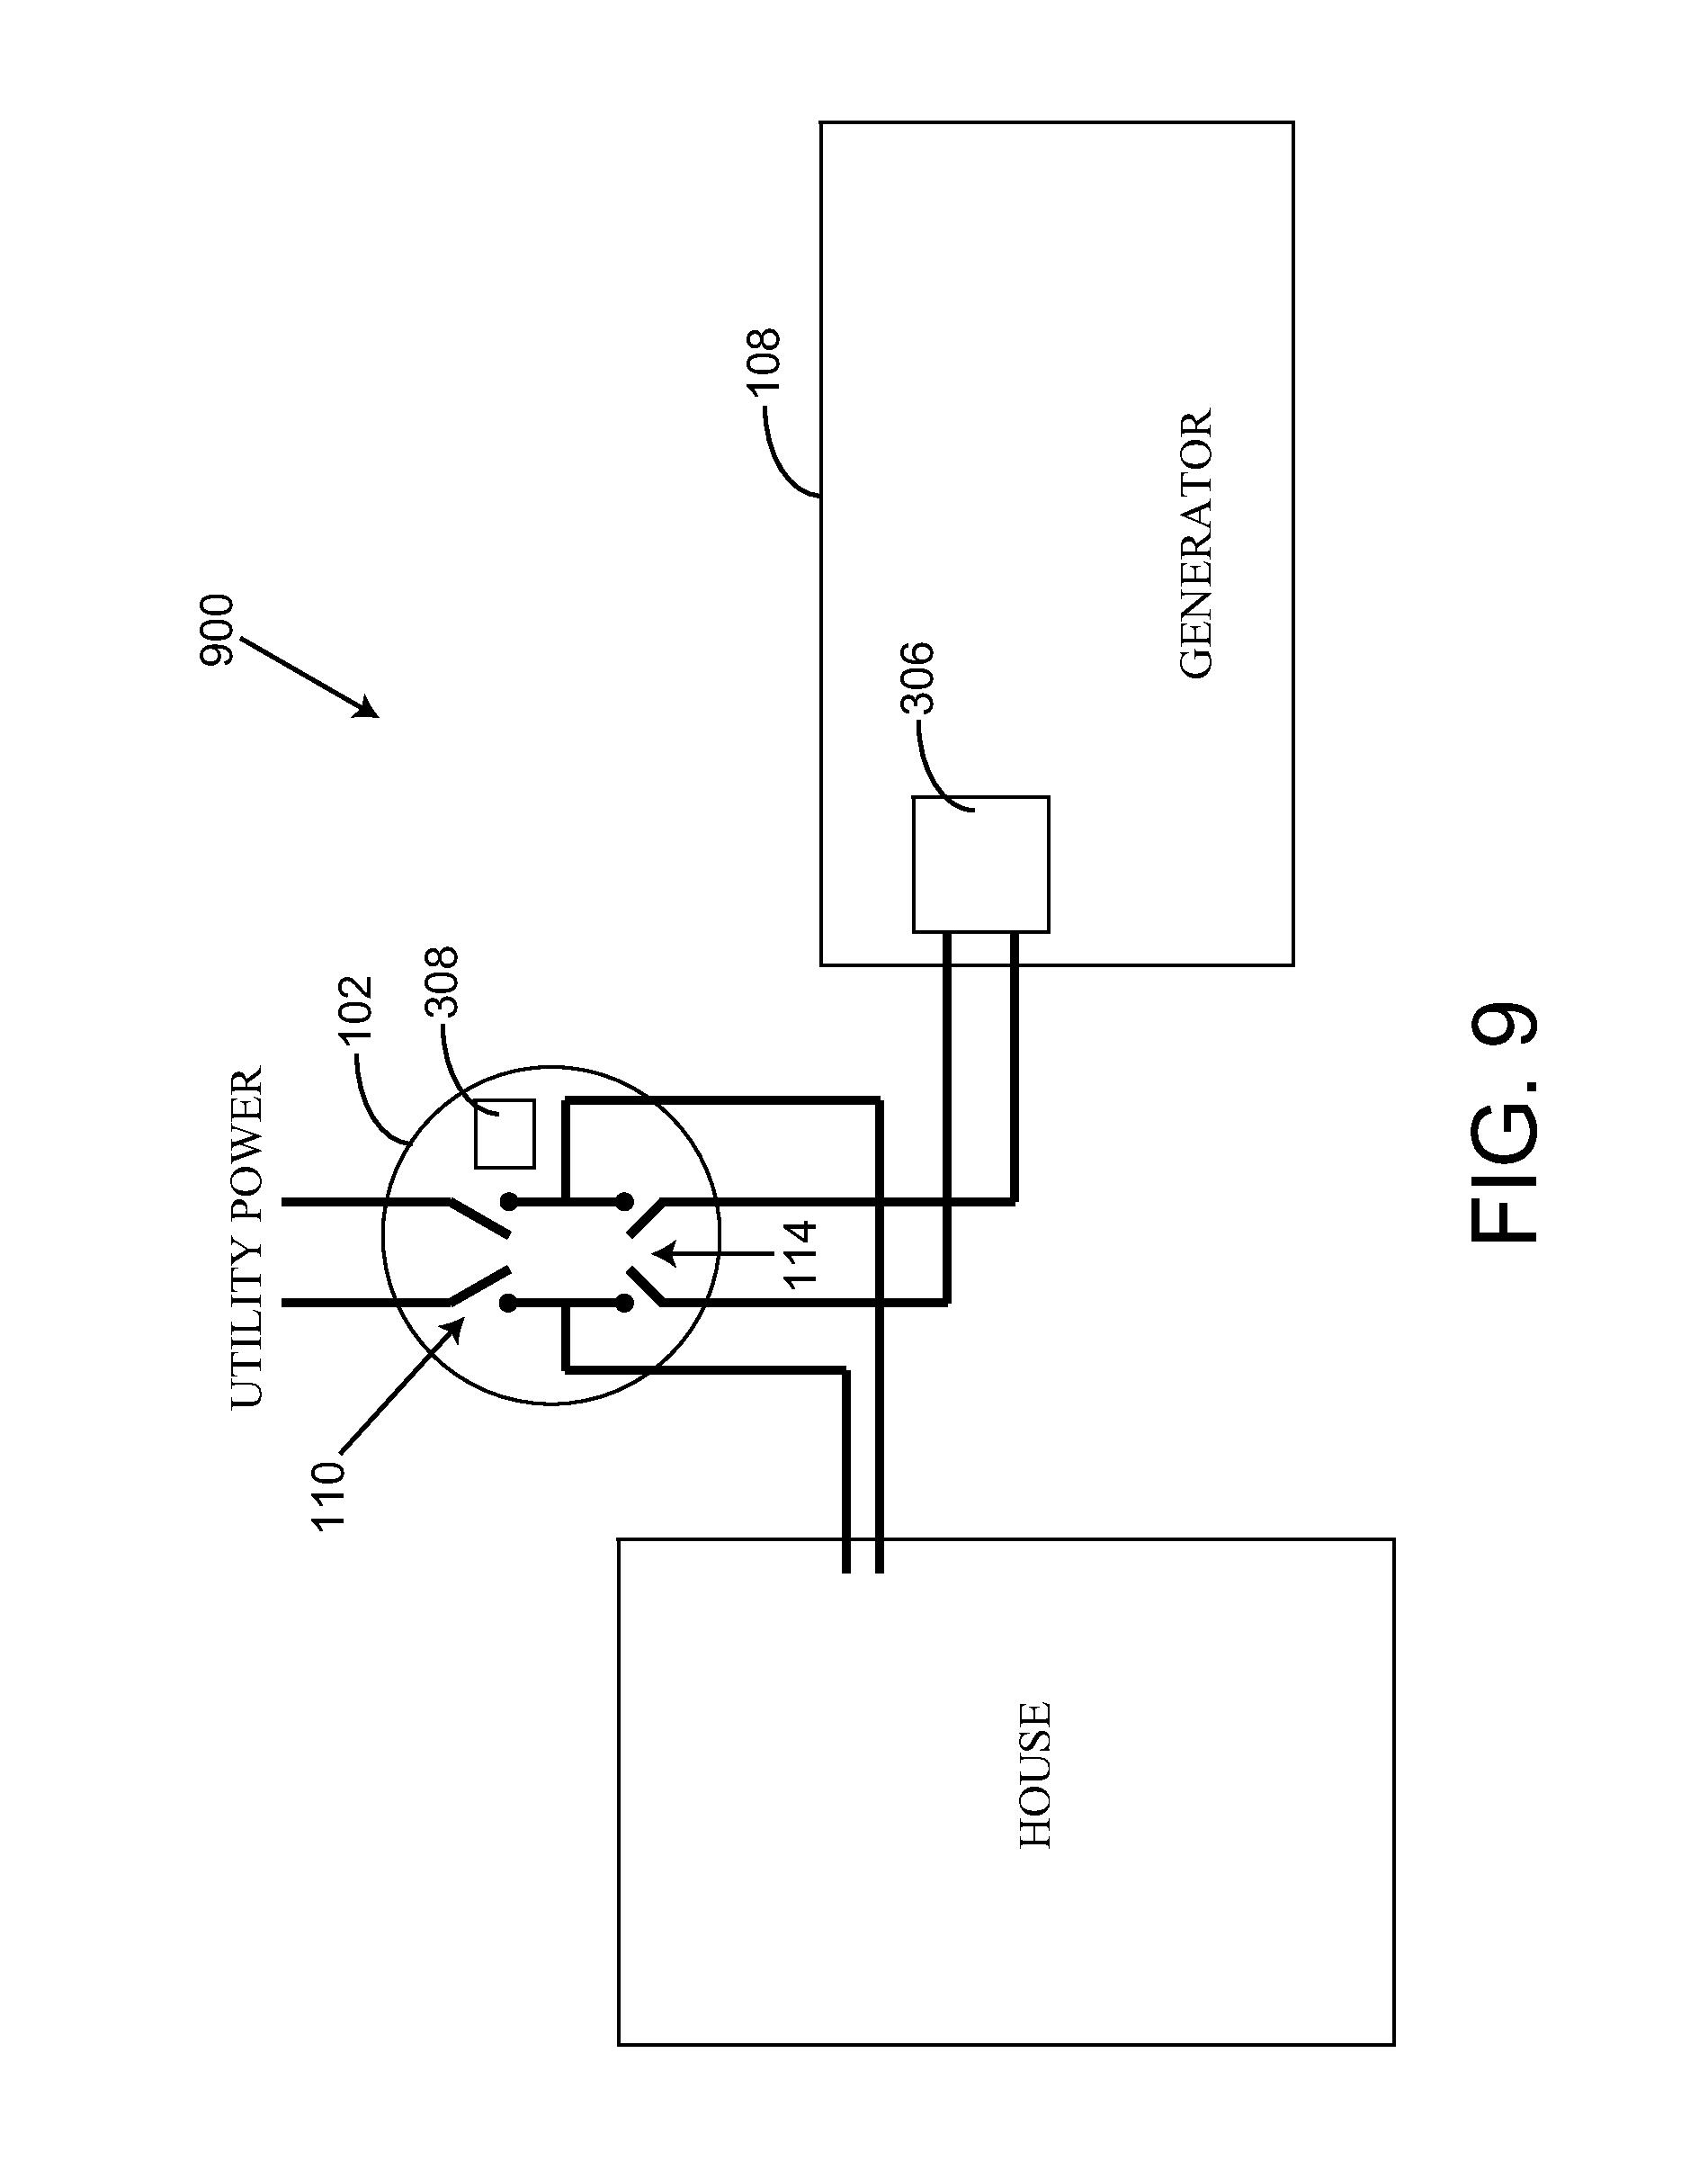 patente us20110175453